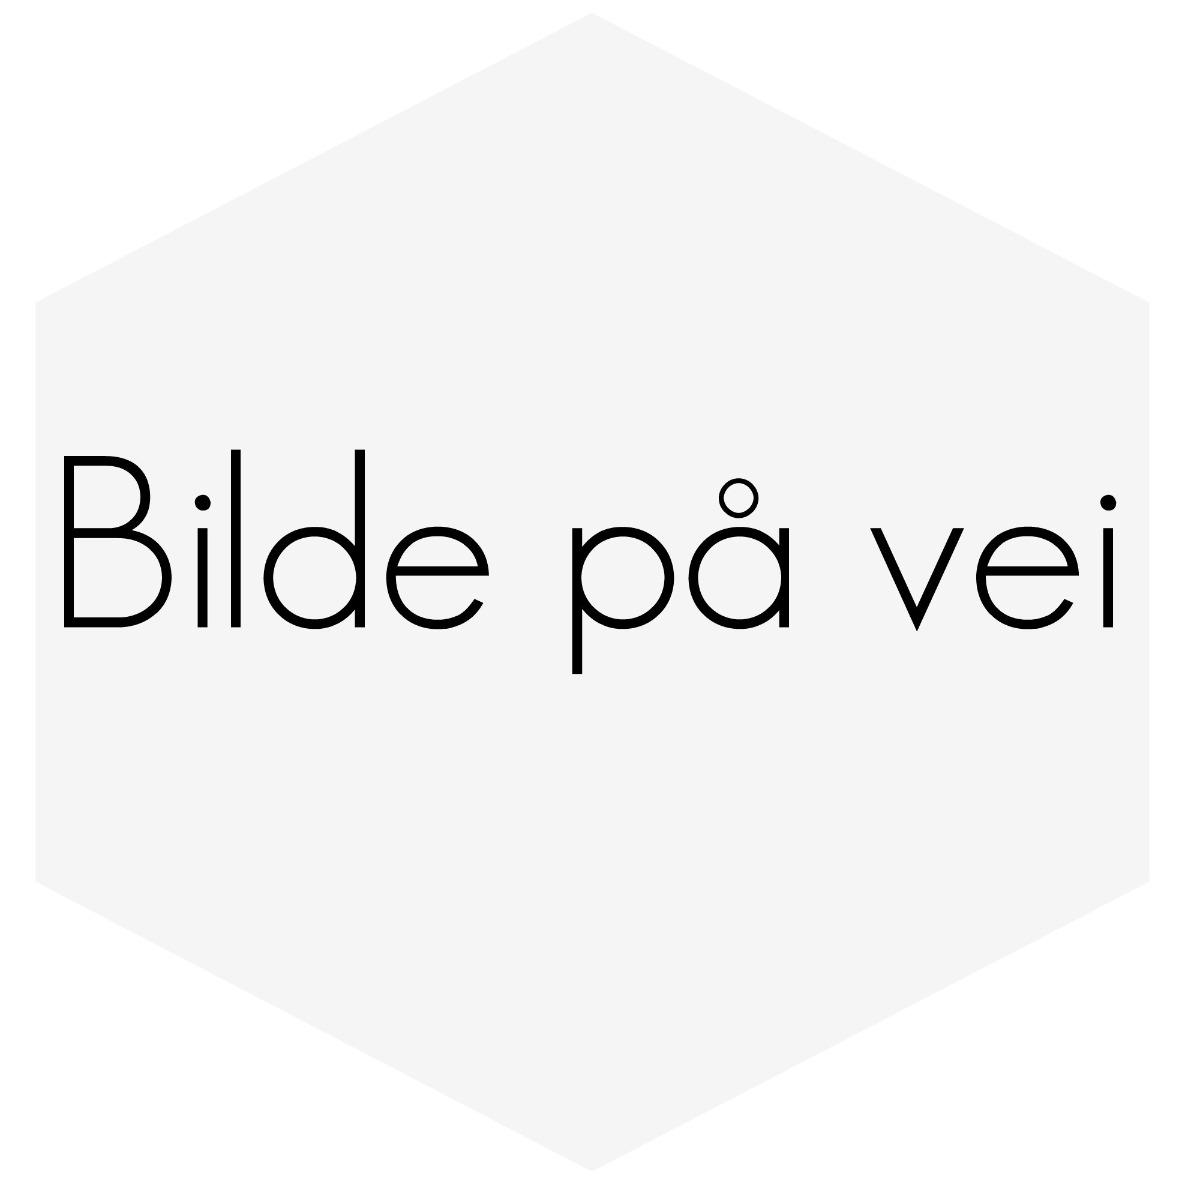 SILIKONSLANGE ARMERT BLÅ 0,625'' (16MM) pris pr meter